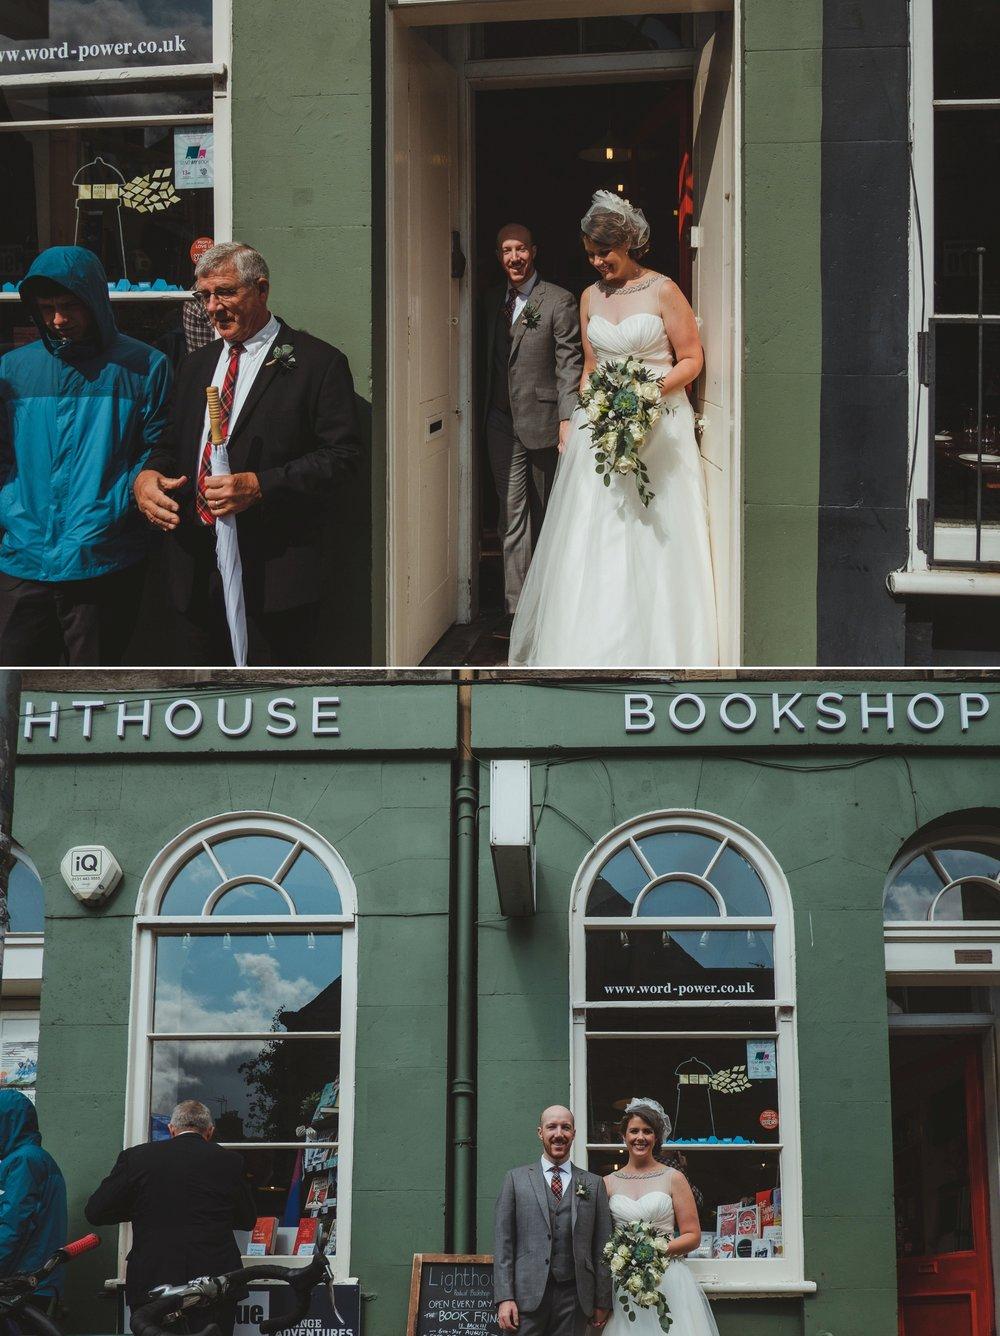 Angela___Andy_s_Edinburgh_elopement_by_Barry_Forshaw_0221.jpg